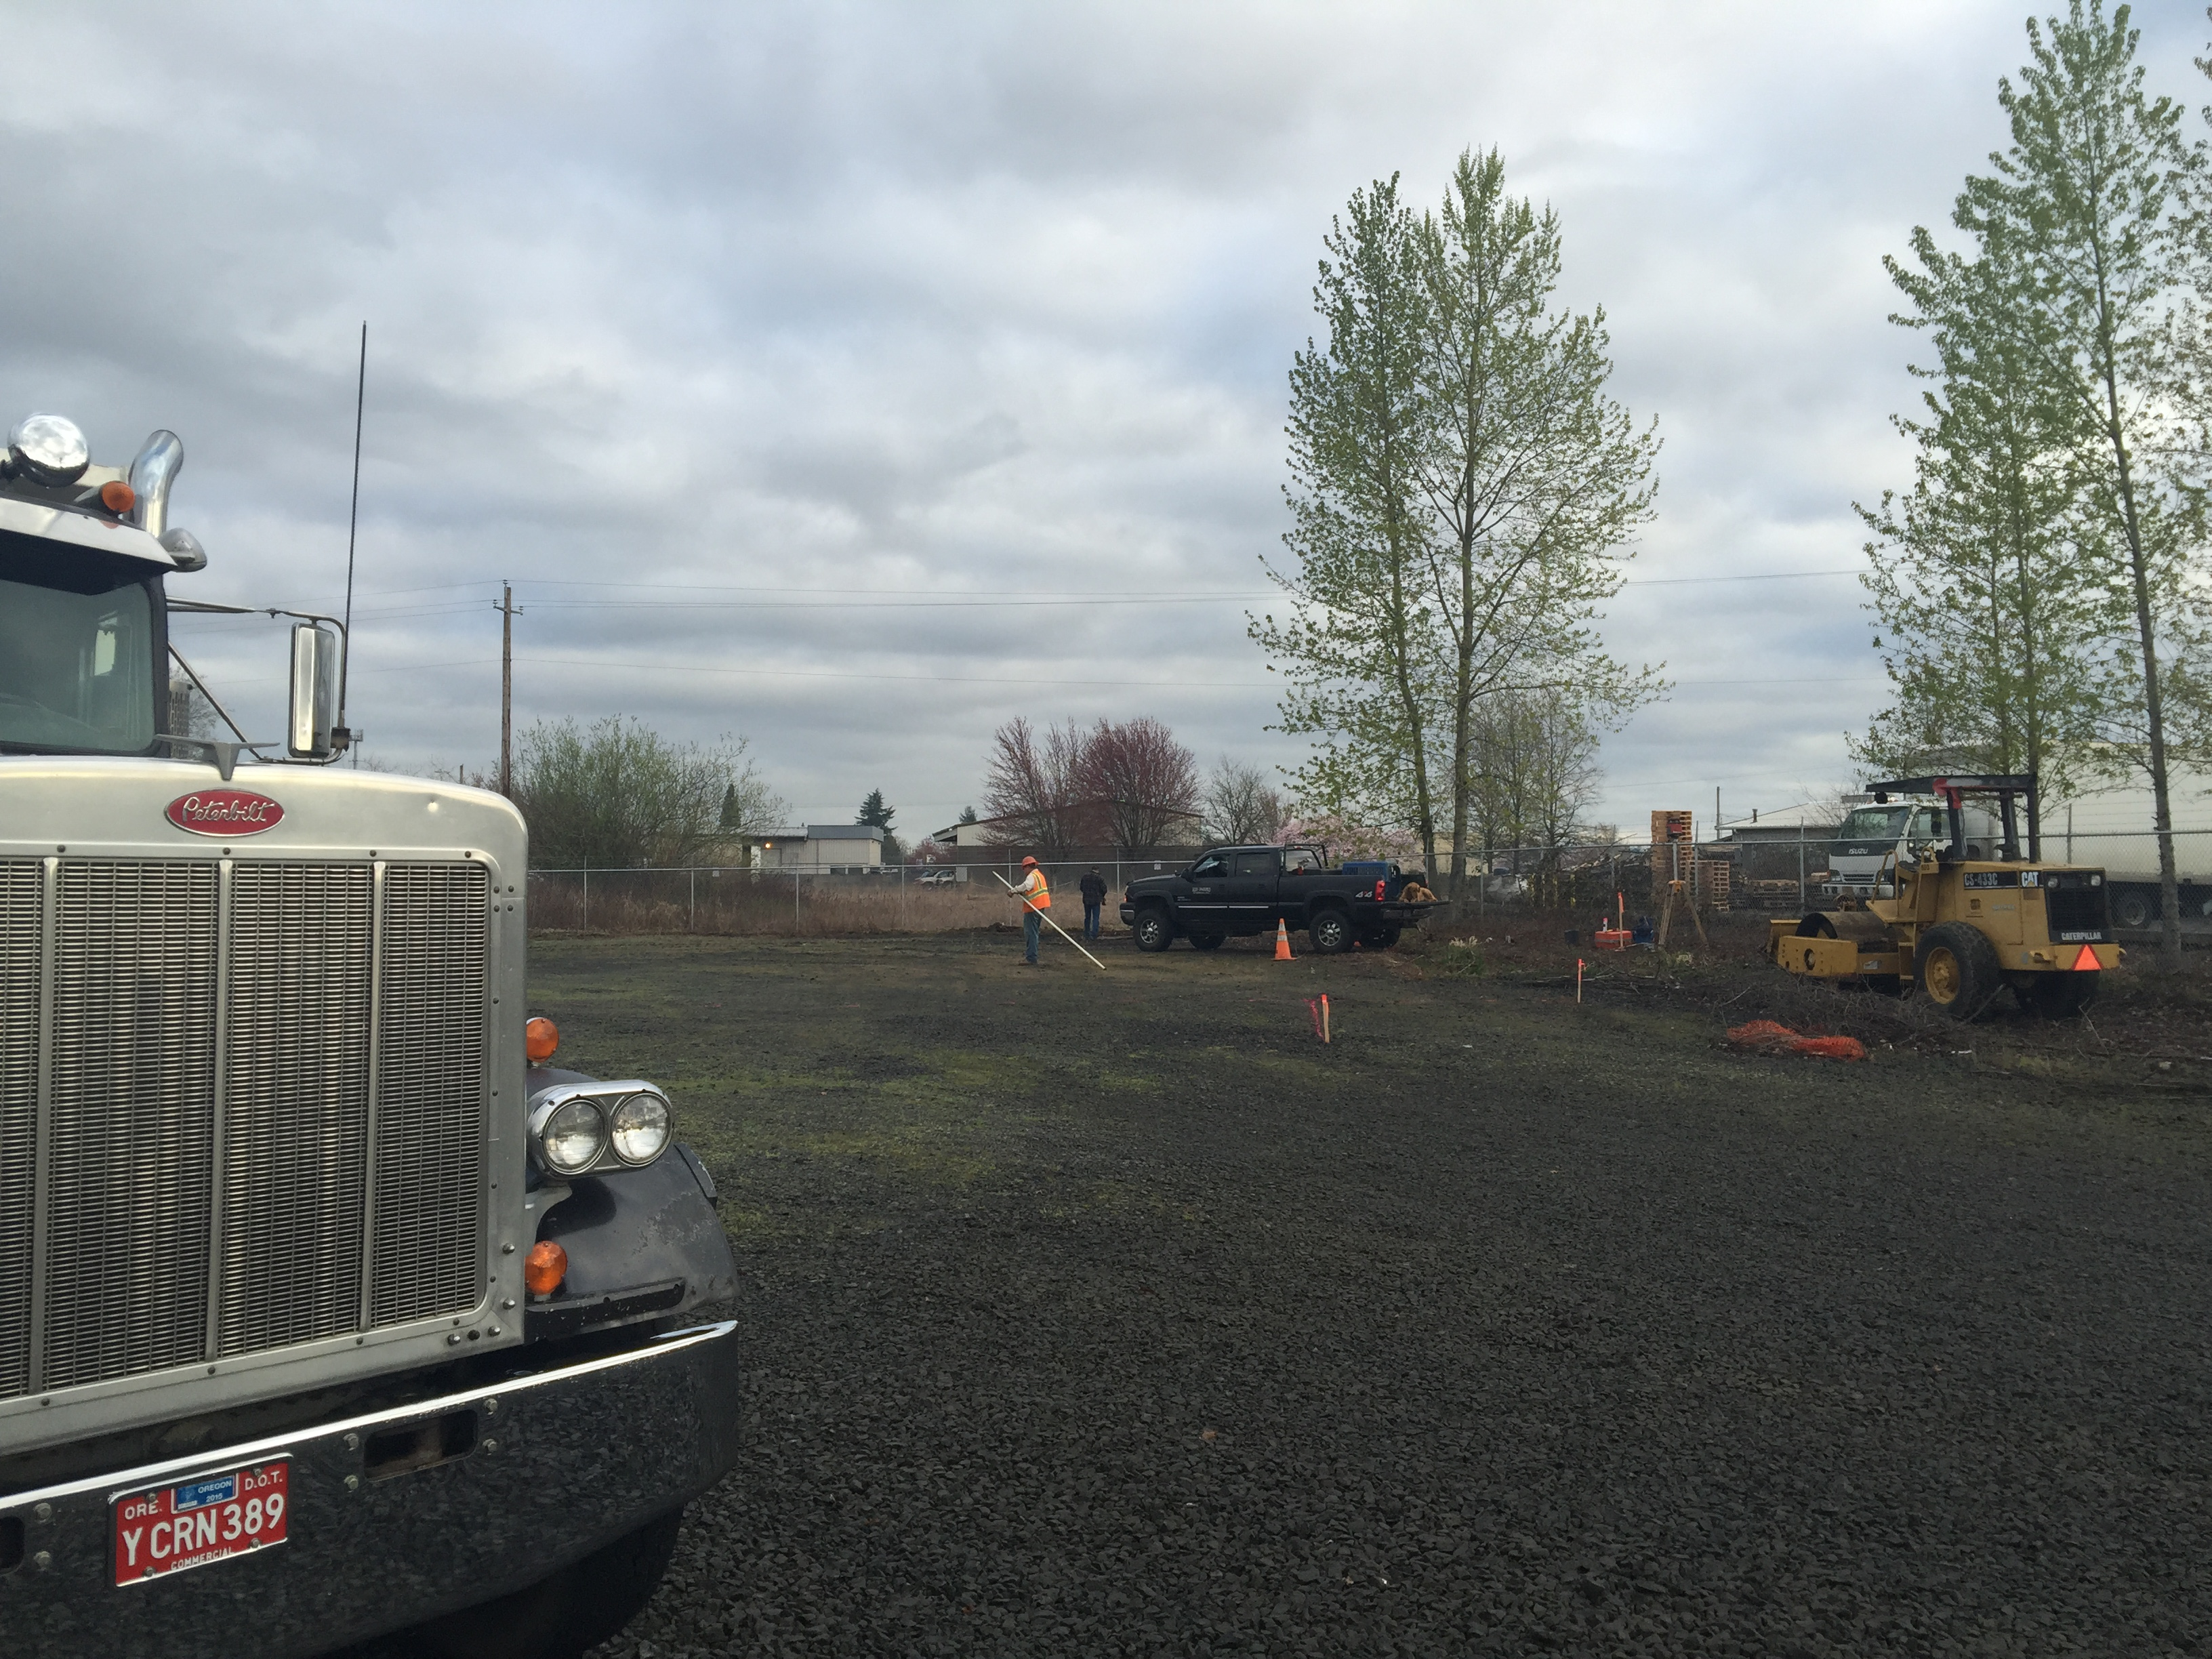 TEKFAB Breaks ground on new expansion